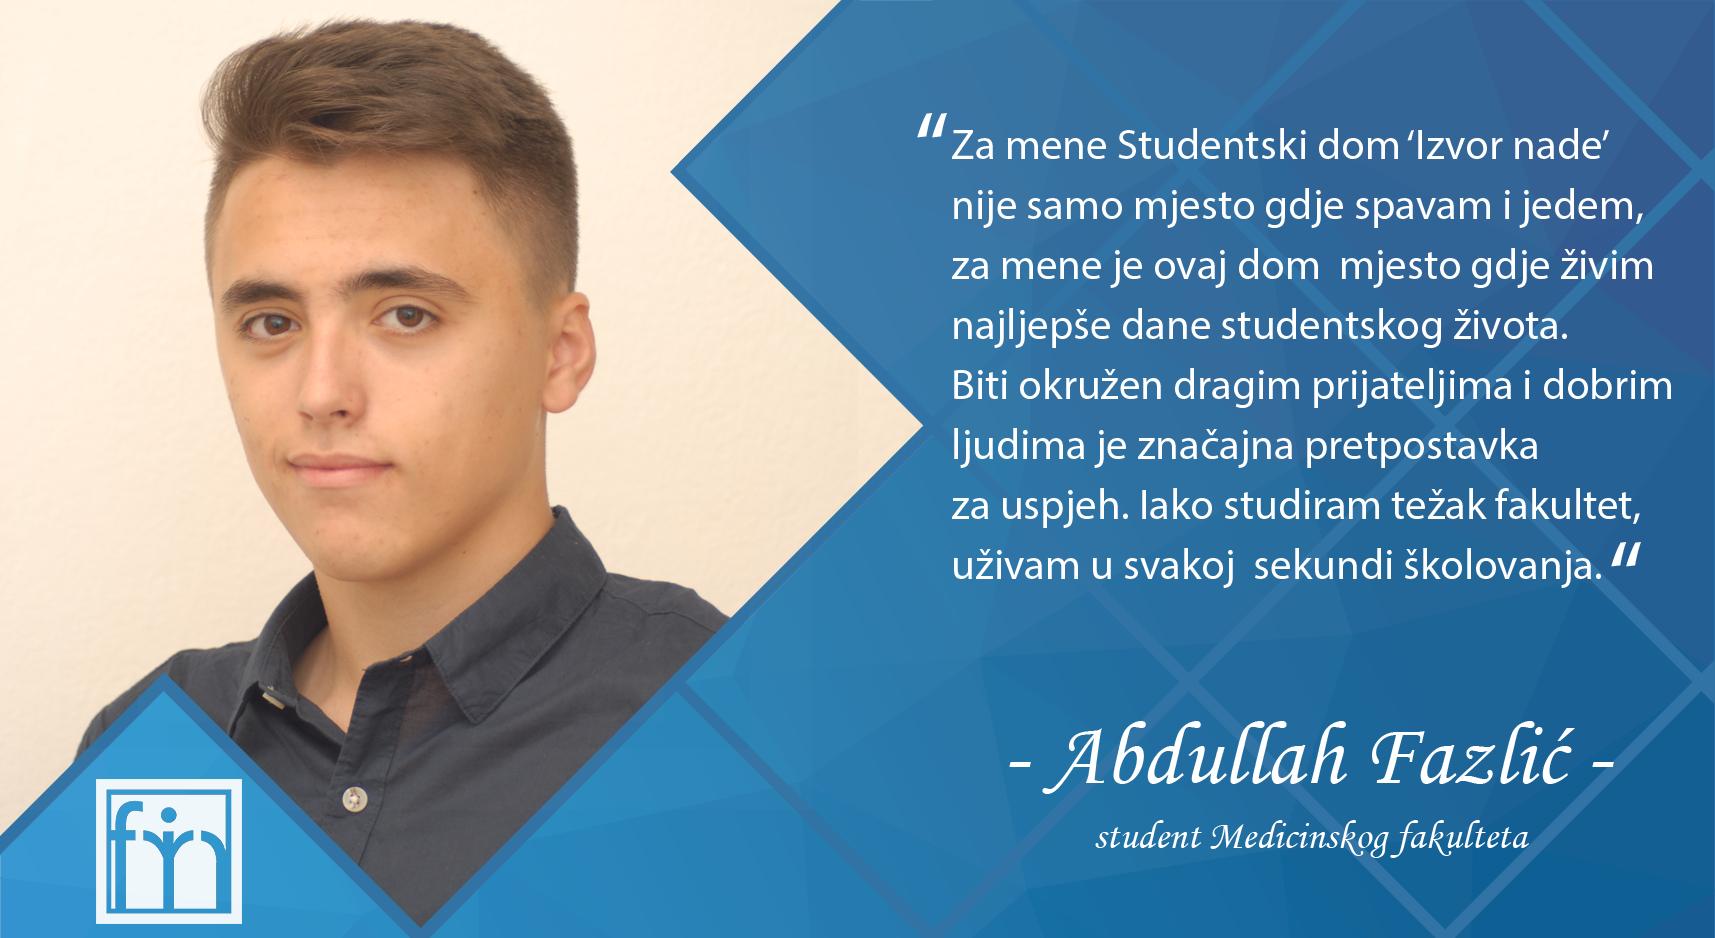 Abdullah_Fazlic_Izvor_nade